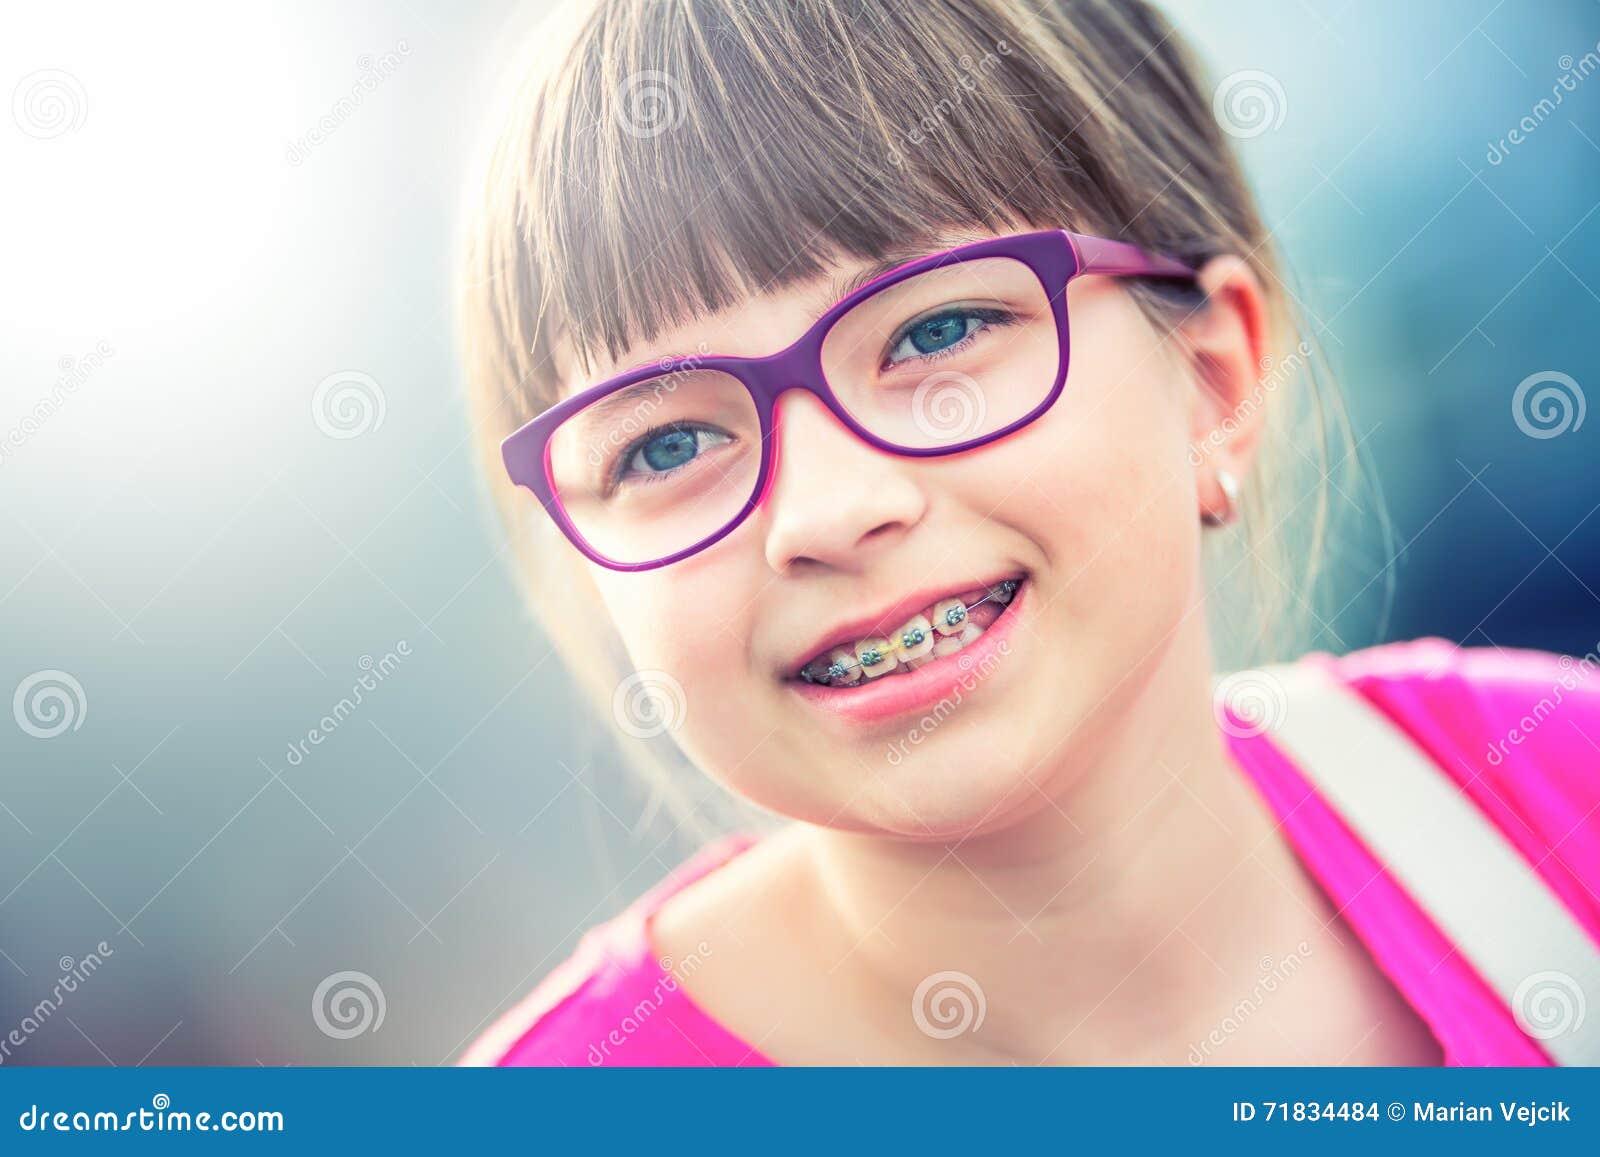 young girl braces nude